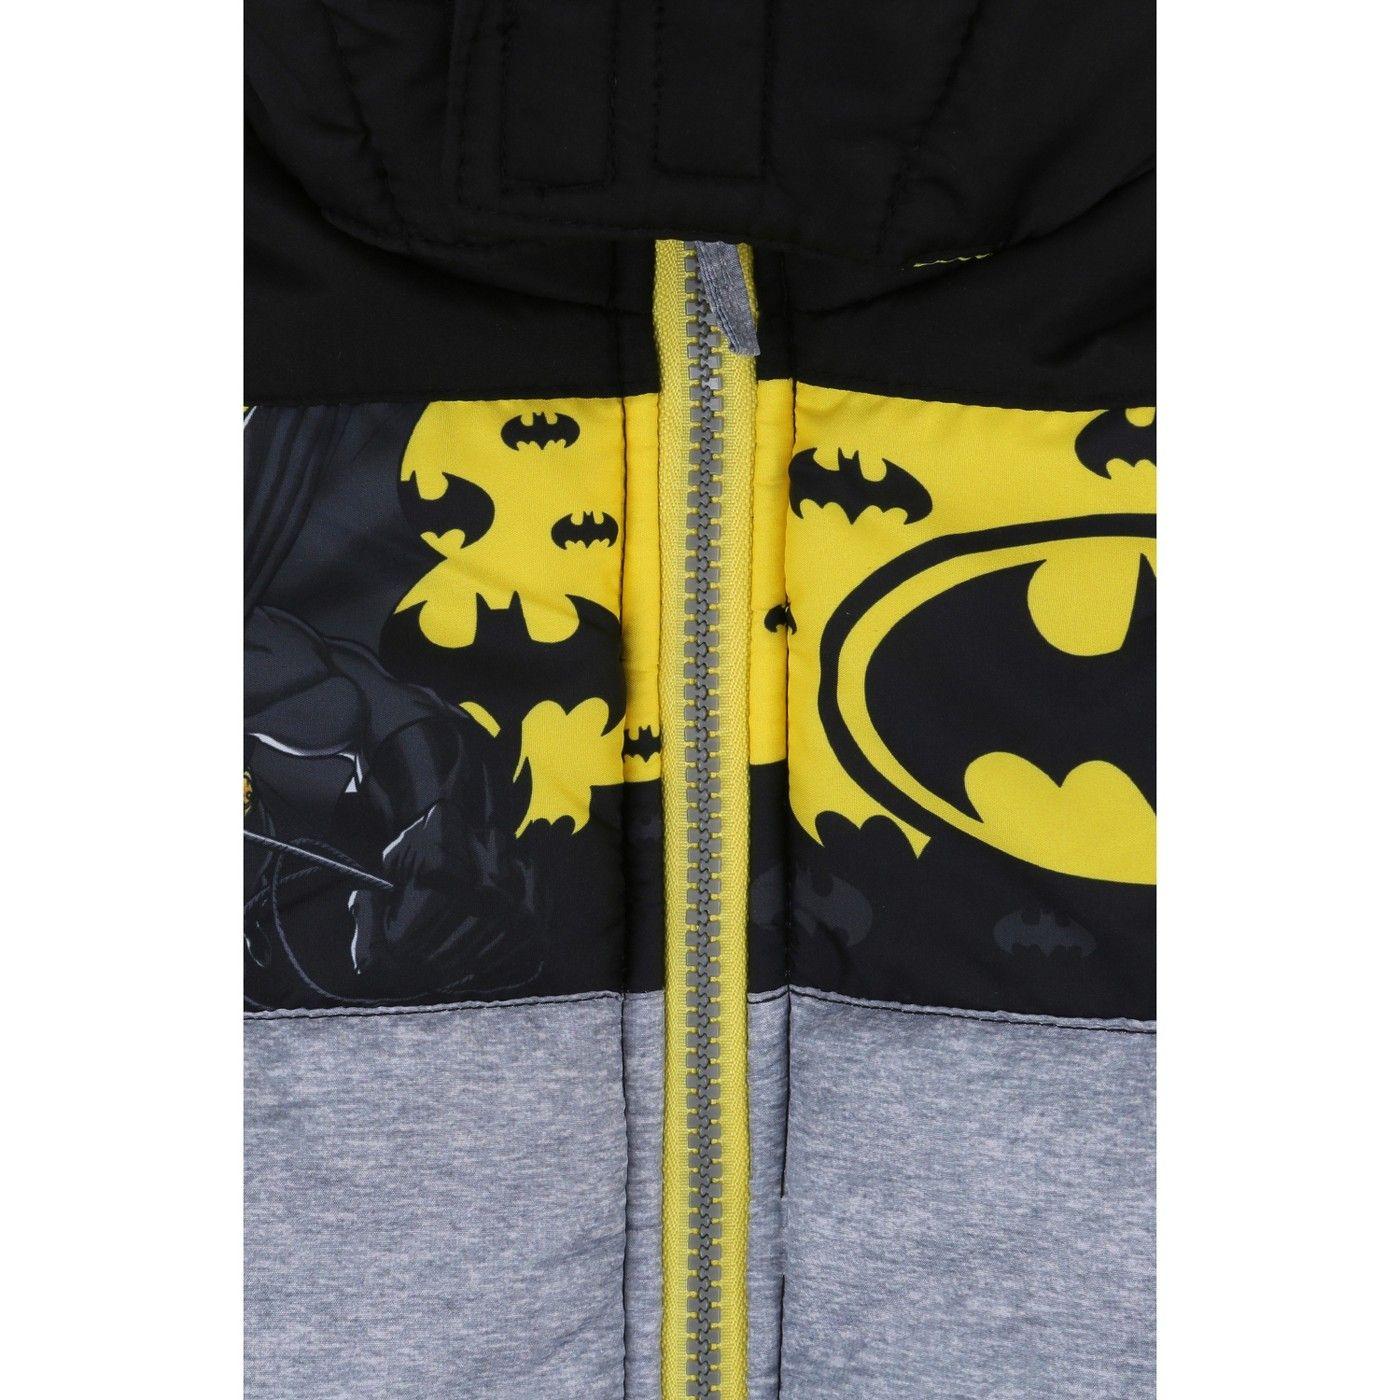 c6d9af3c9 Boys  Batman Puffer Jacket - Black 4  Batman